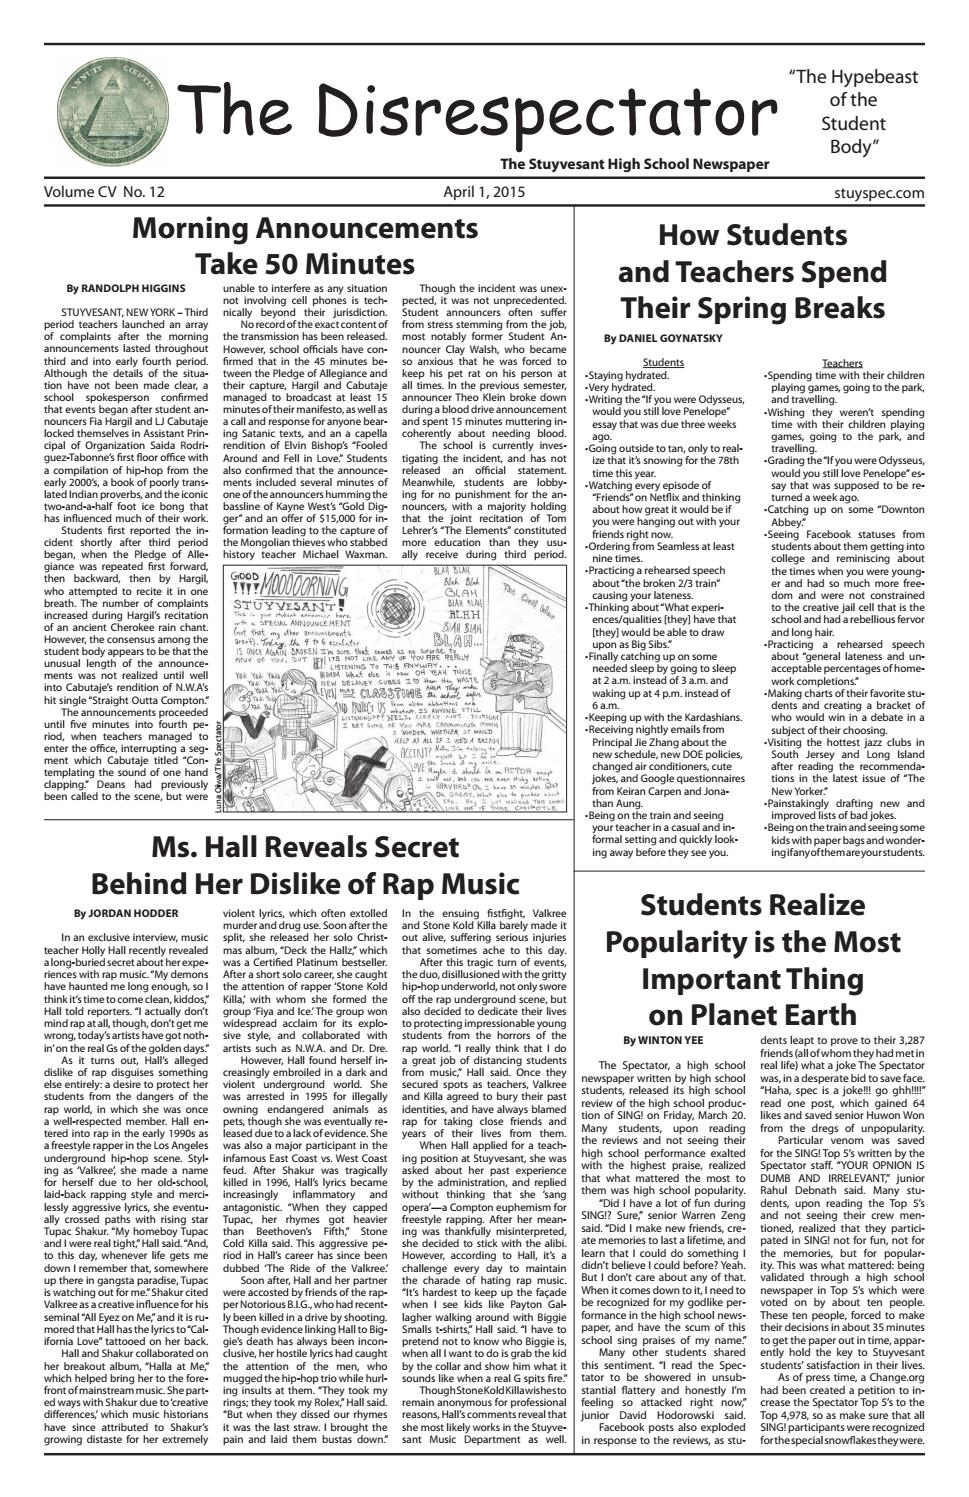 Volume 105, Issue 12 by The Stuyvesant Spectator - issuu